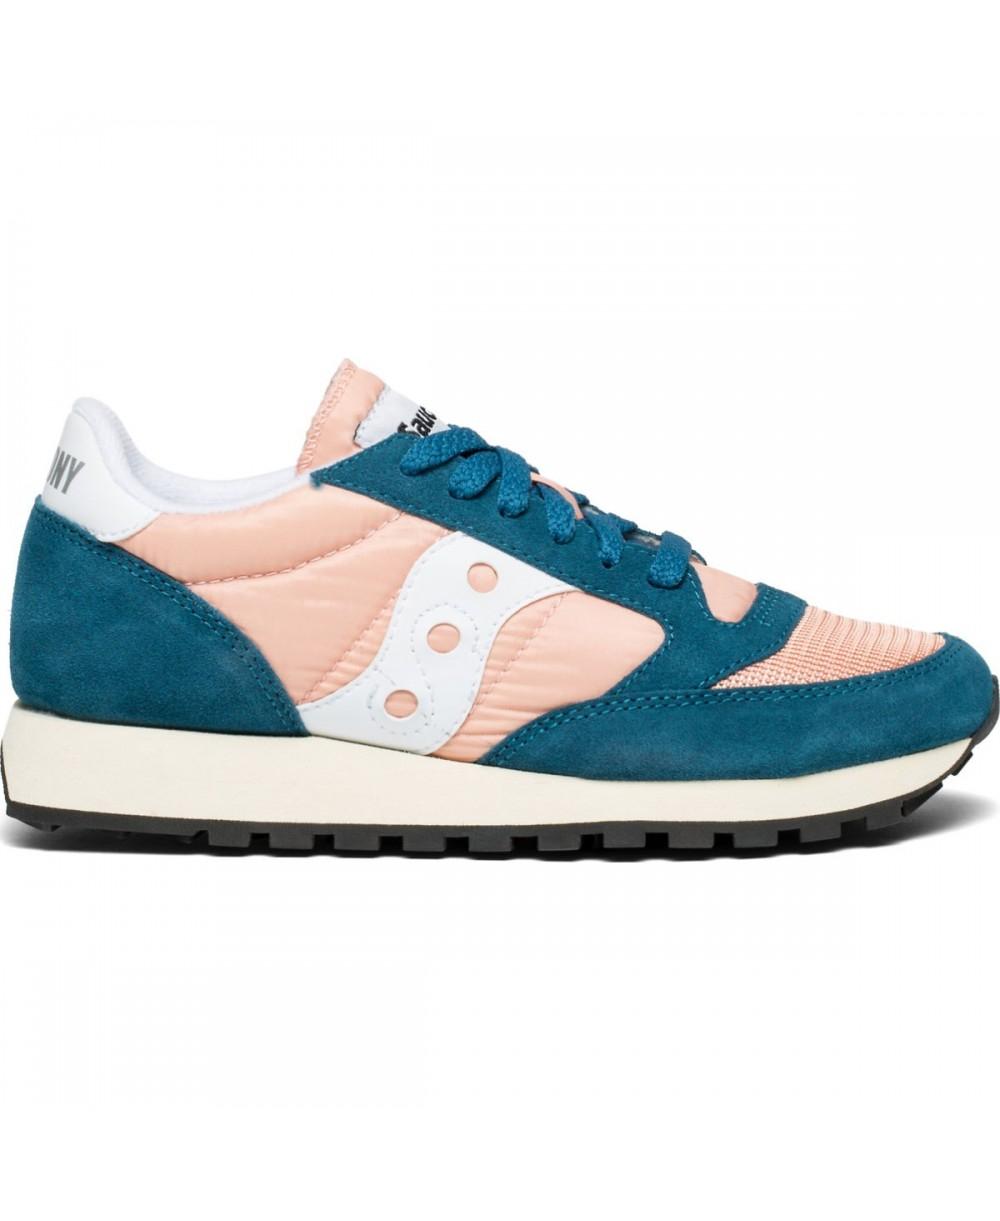 Saucony Navy Blue & Orange Jazz Original Vintage Sneaker